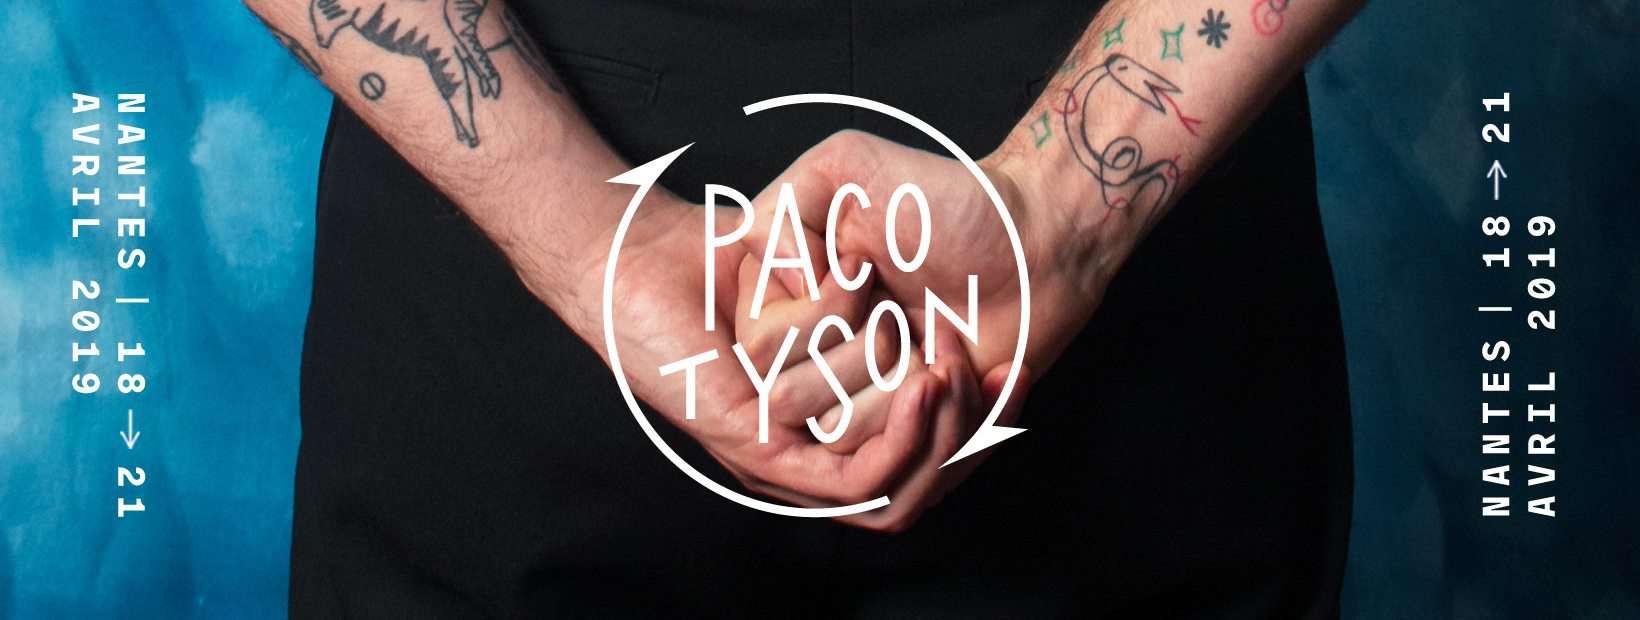 festival paco tyson 2019